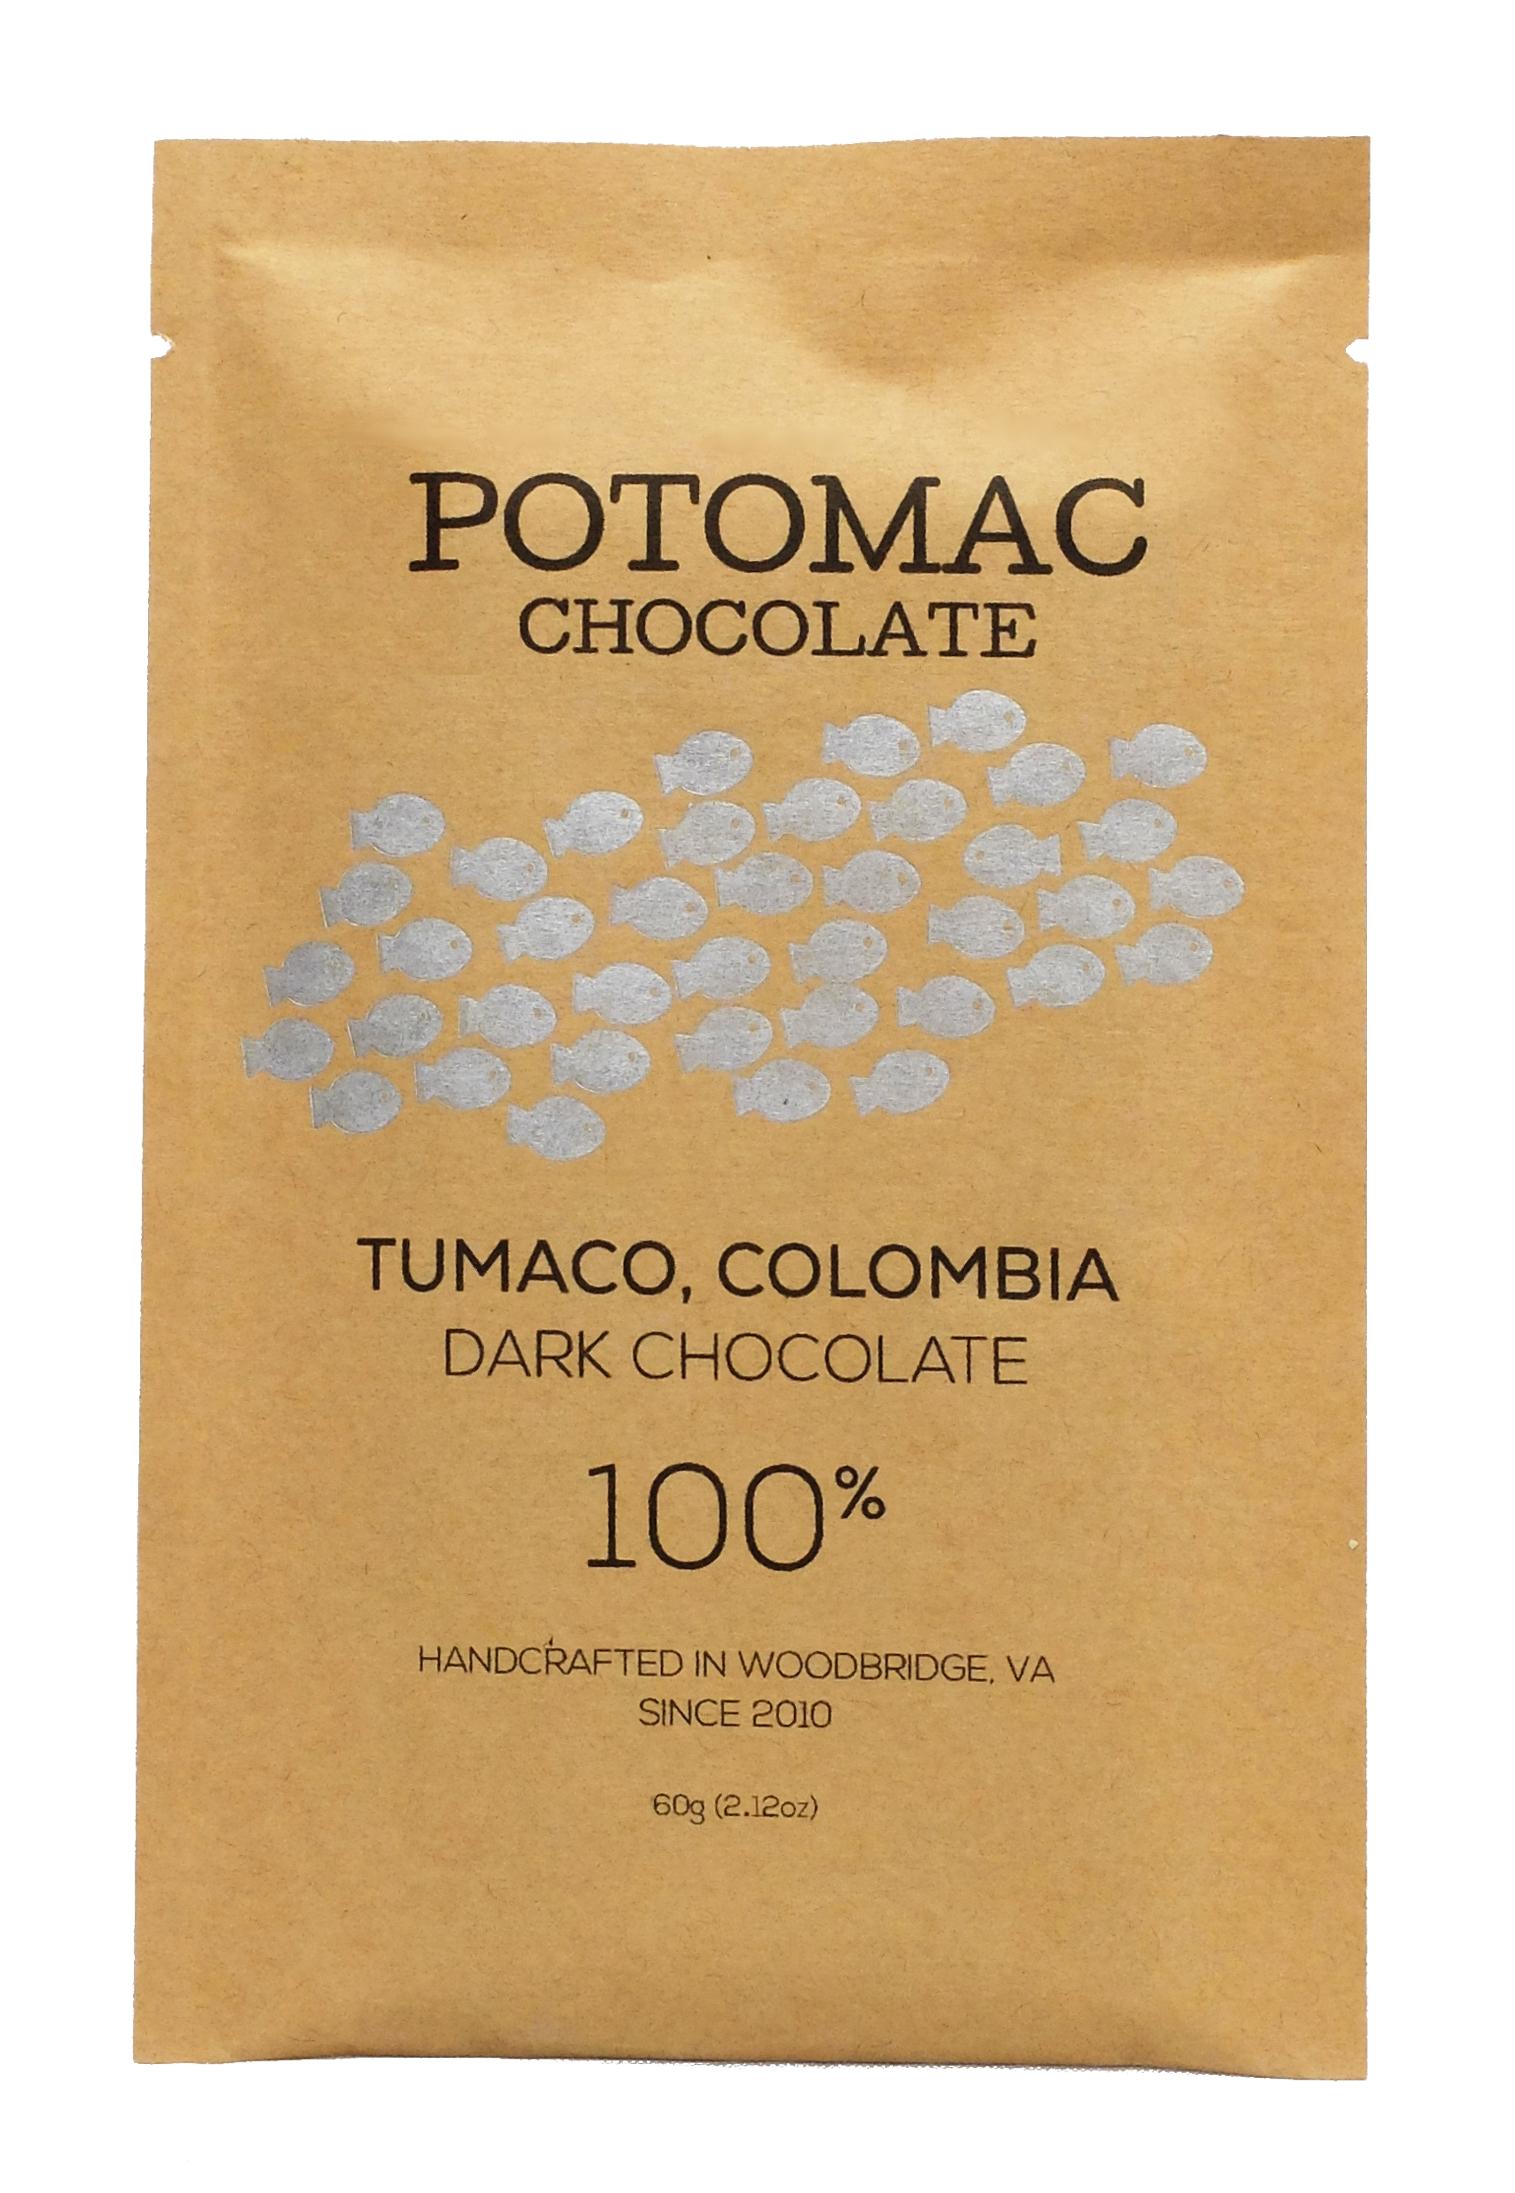 Potomac Chocolate - Tumaco, Colombia 100% Extra Dark Chocolate